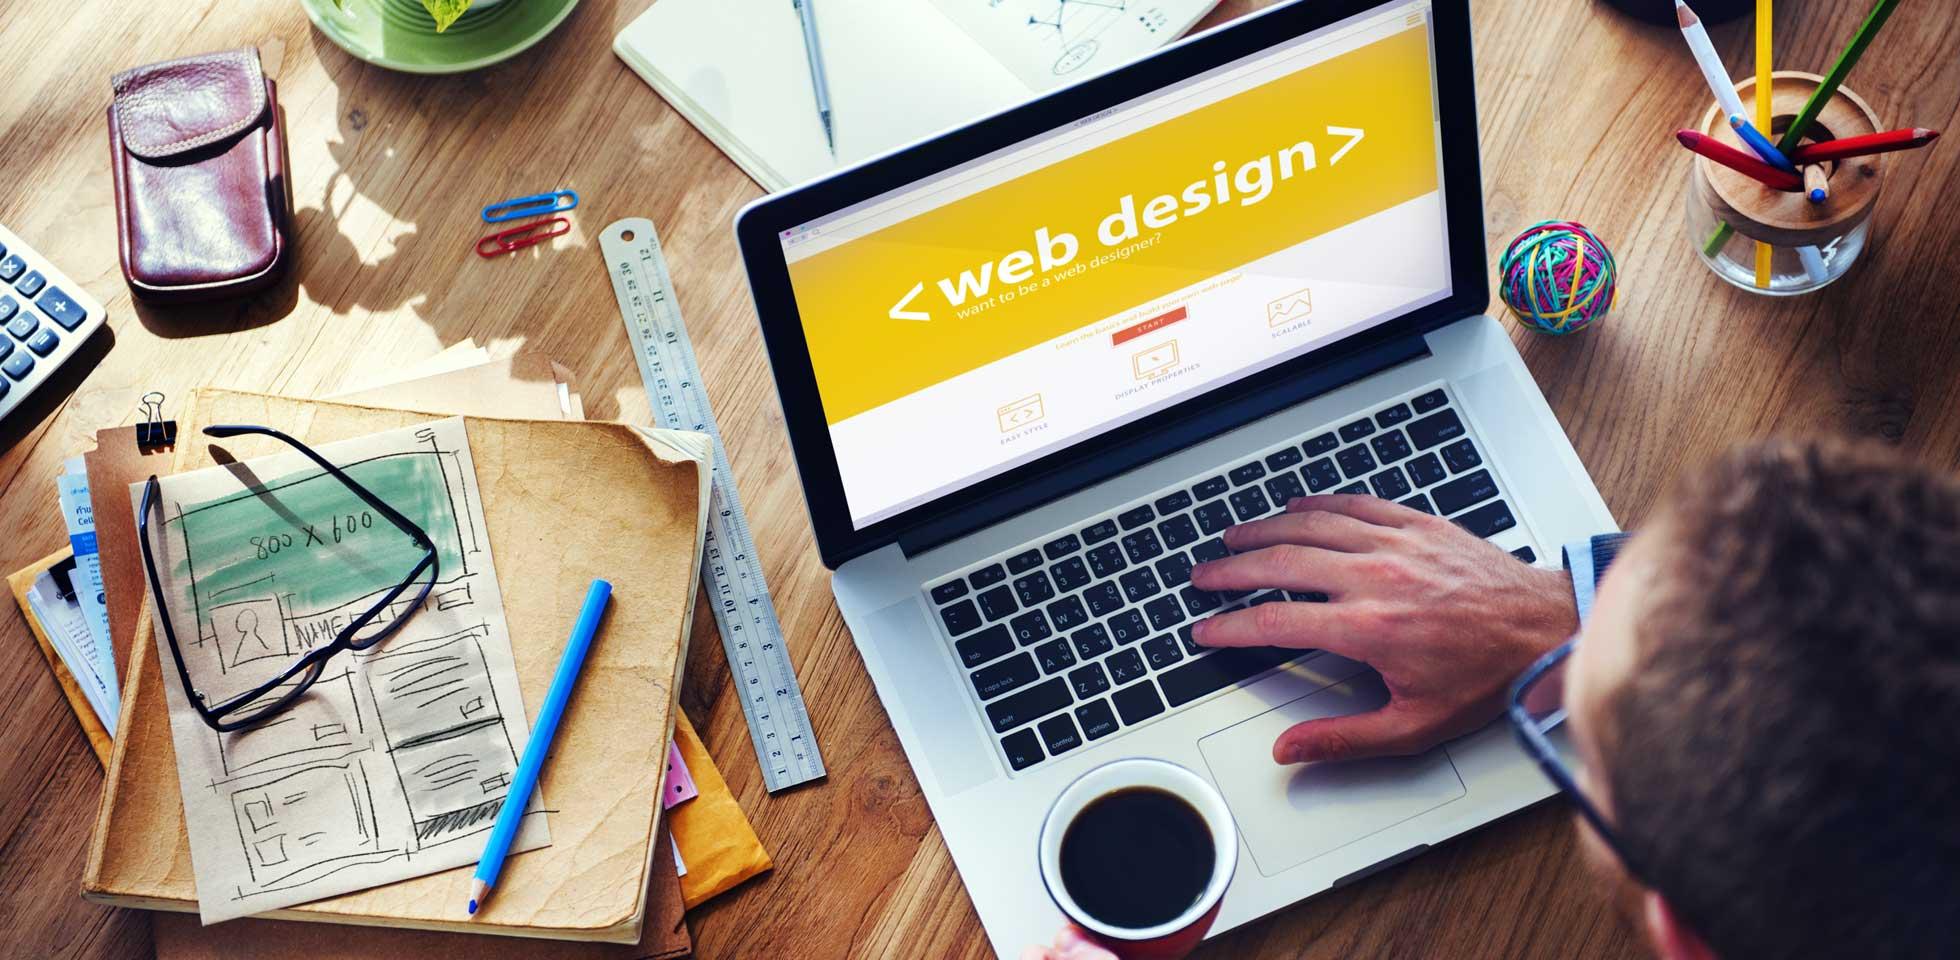 5 killer web design features that will skyrocket your online business - Website Design Depends on the Expertise of the Web Designer